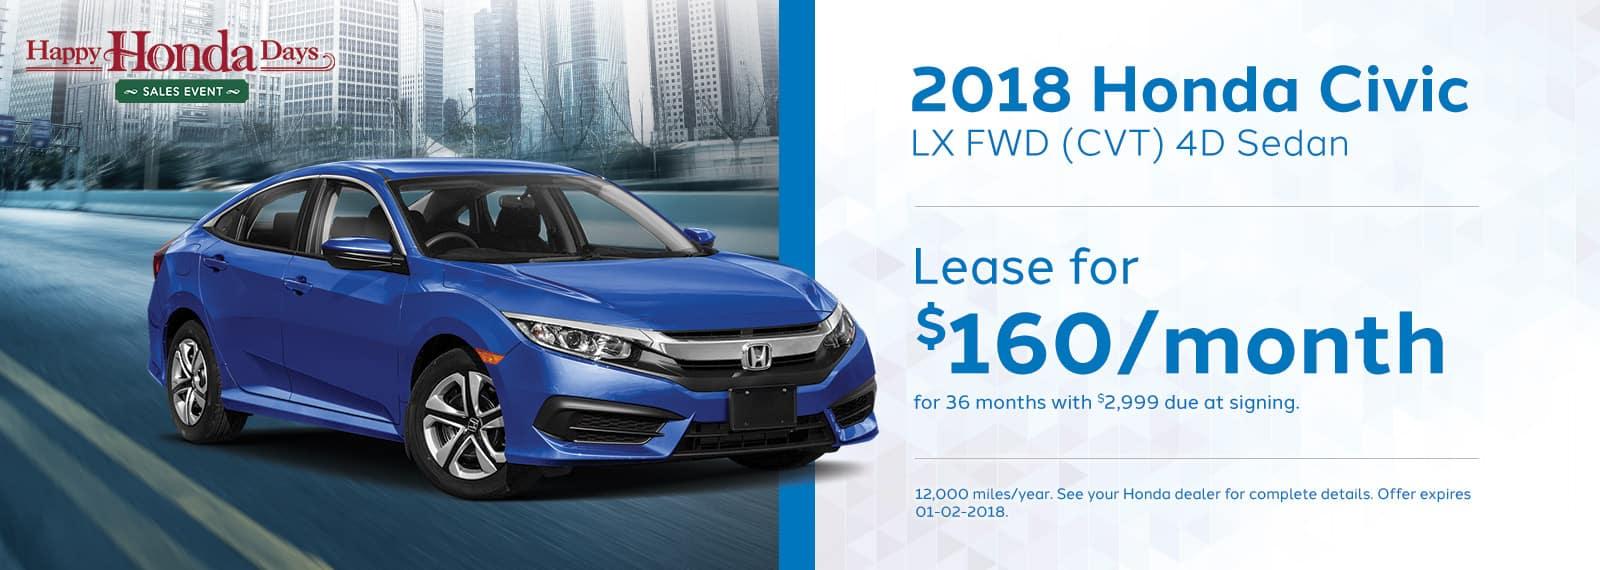 GENHONDA_Happy Honda Days Homepage_1600x570_Civic-LX-Sedan-